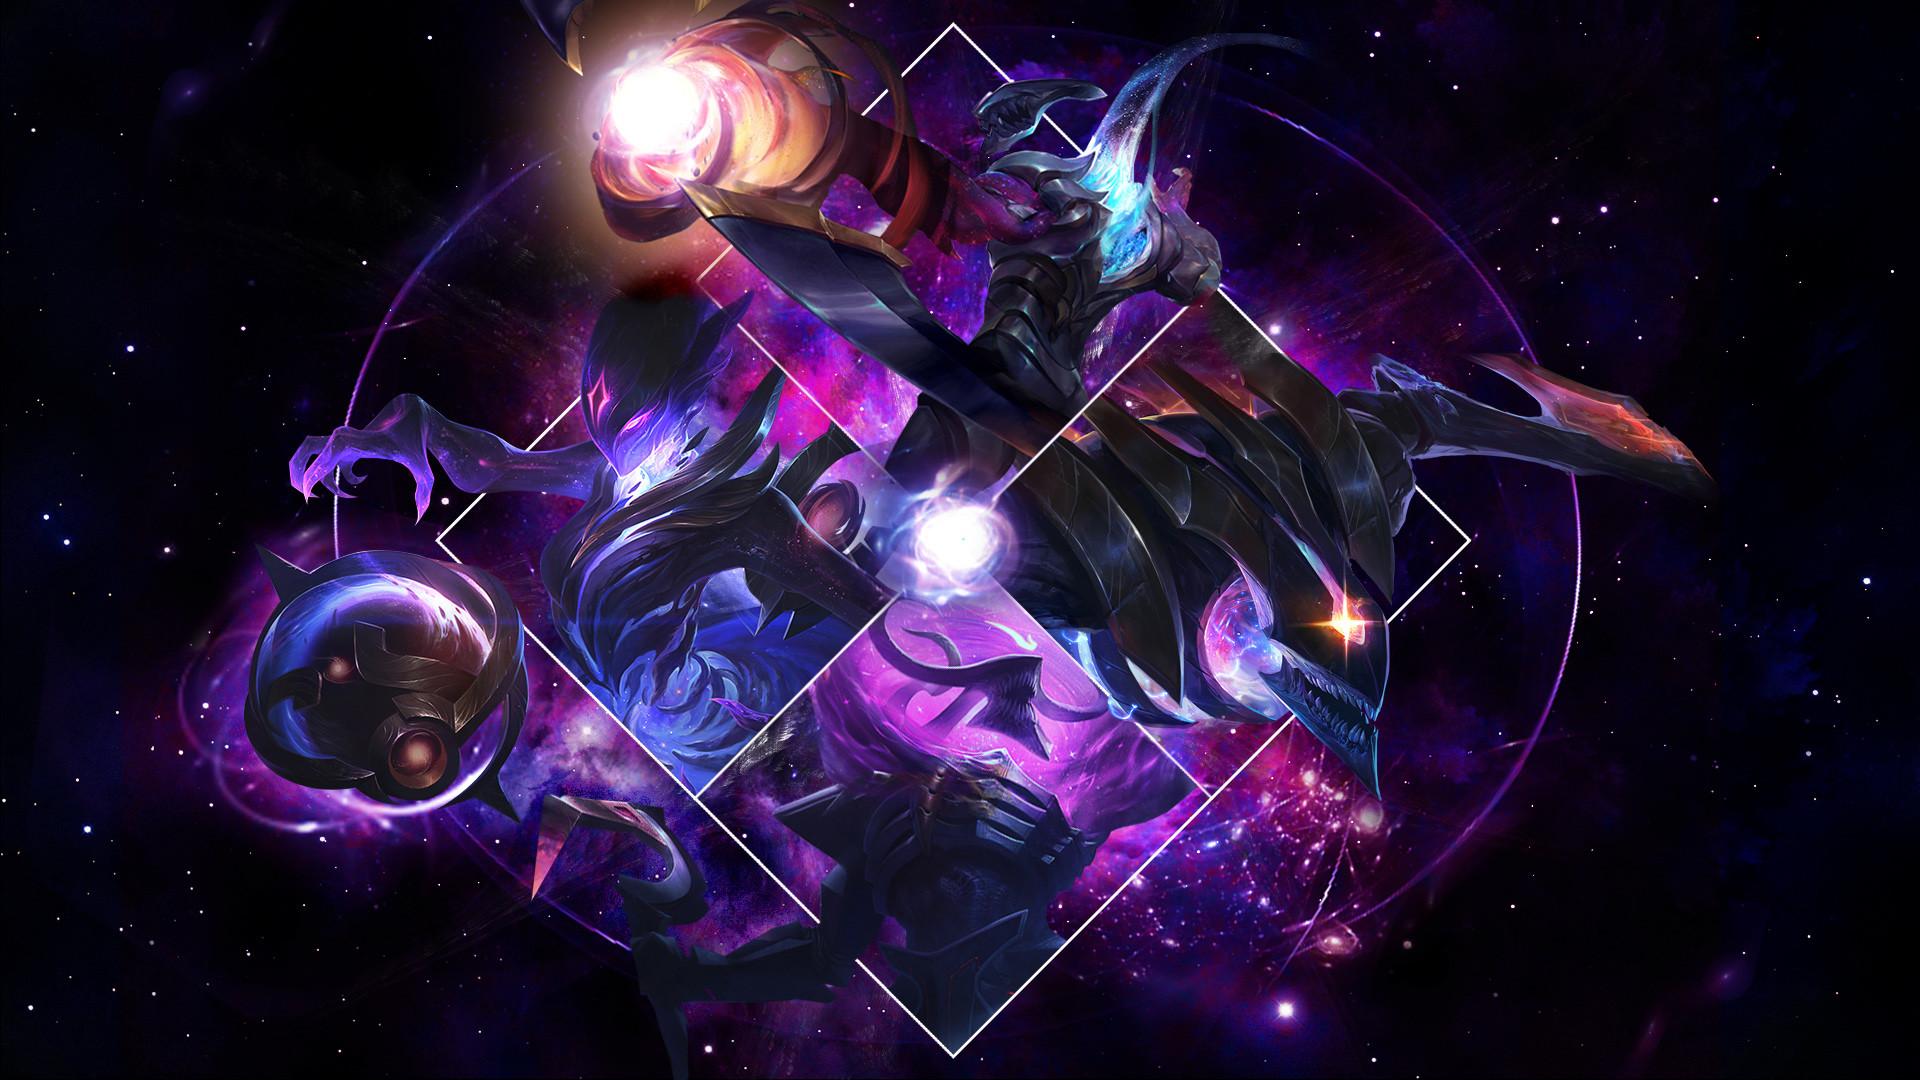 Dark Star Orianna Kha'Zix, Thresh & Varus by syraelx HD Wallpaper Fan Art